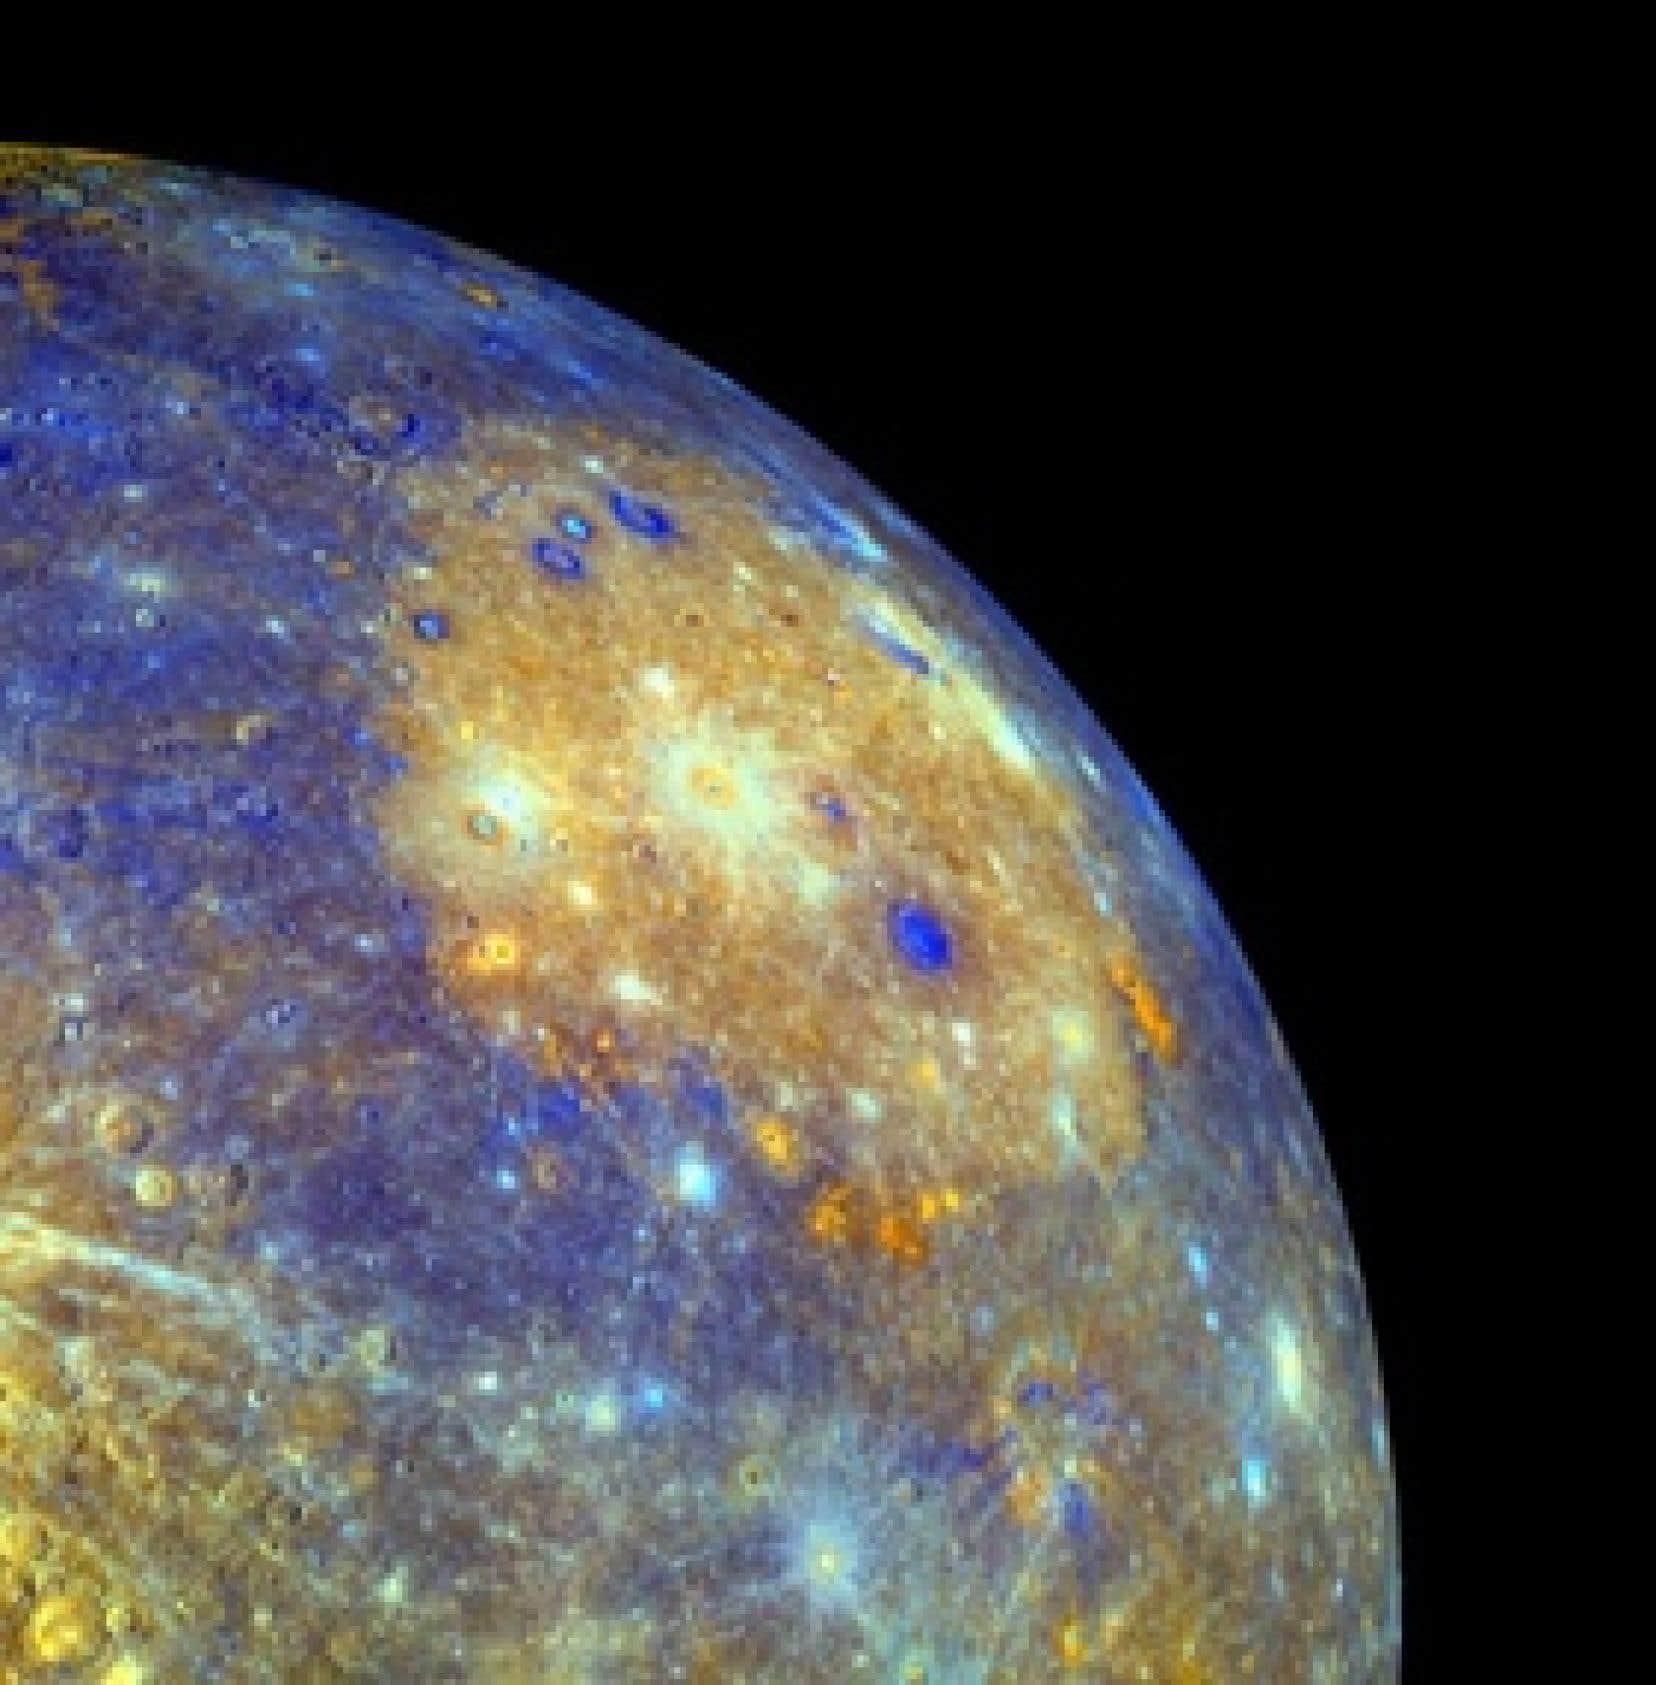 color planet mercury - HD1012×1030